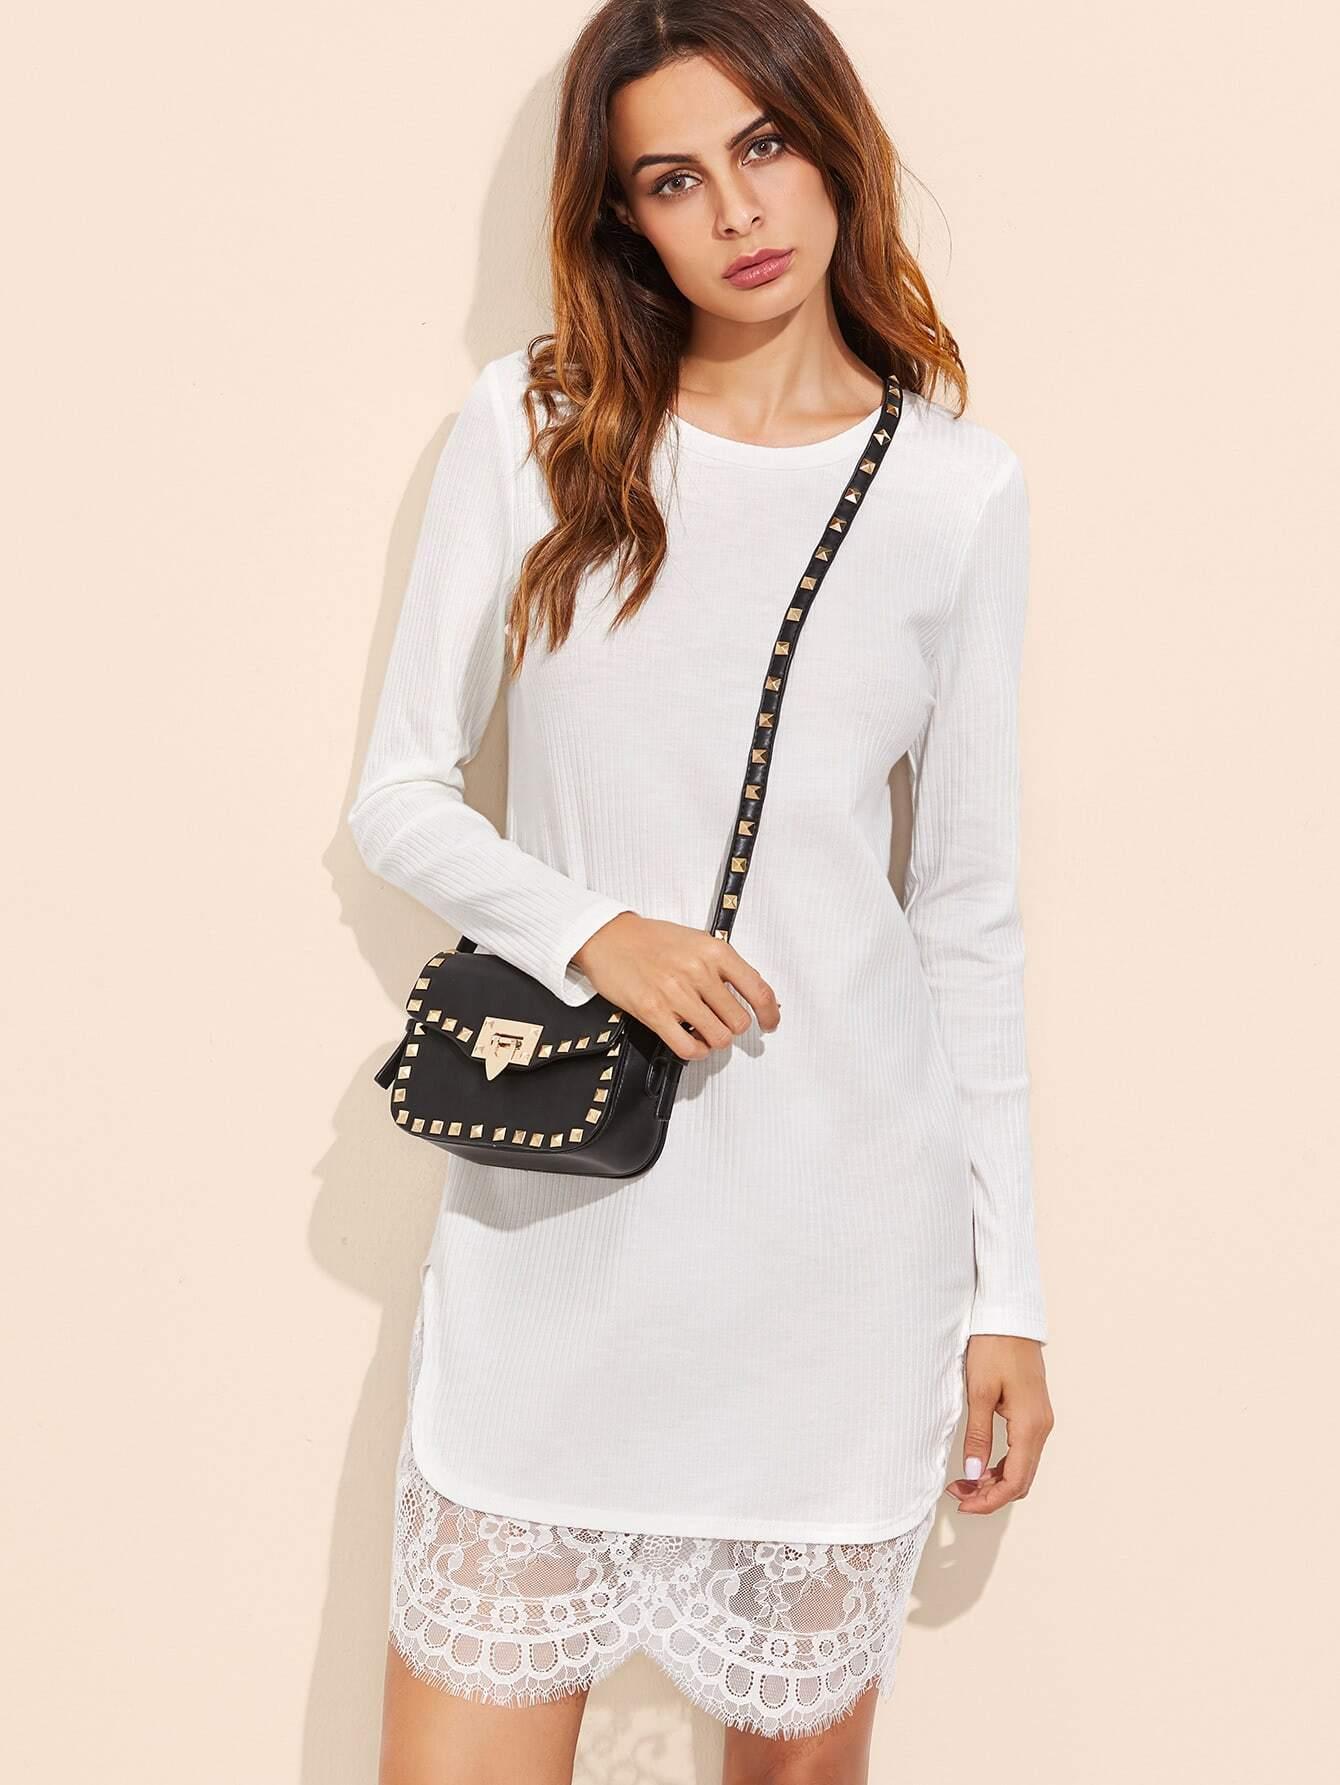 White Ribbed Knit Floral Lace Trim Dress dress161028706